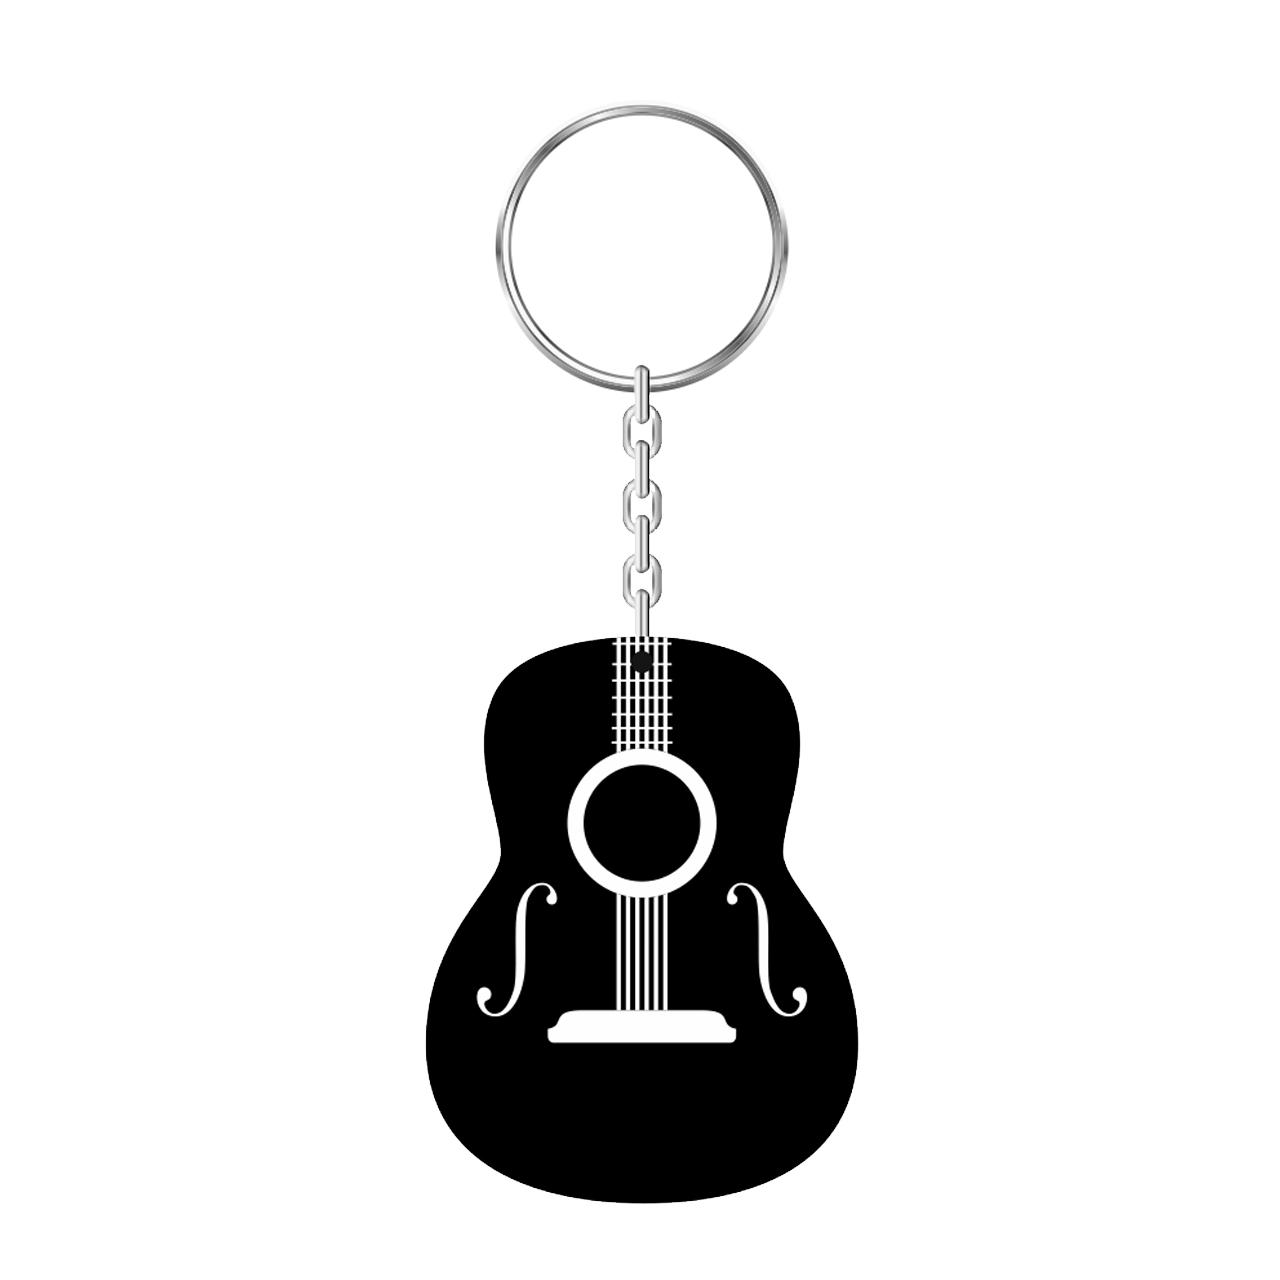 جاکلیدی طرح گیتار مدل JS036